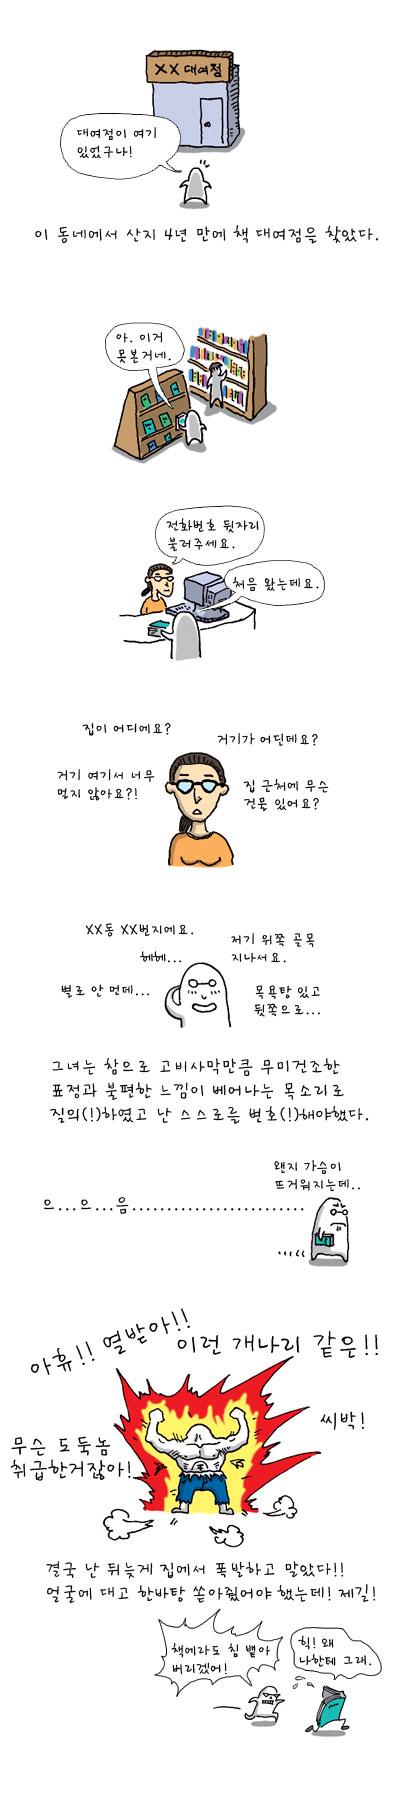 Self_Fish's 명랑 문화 공작소 – 051002